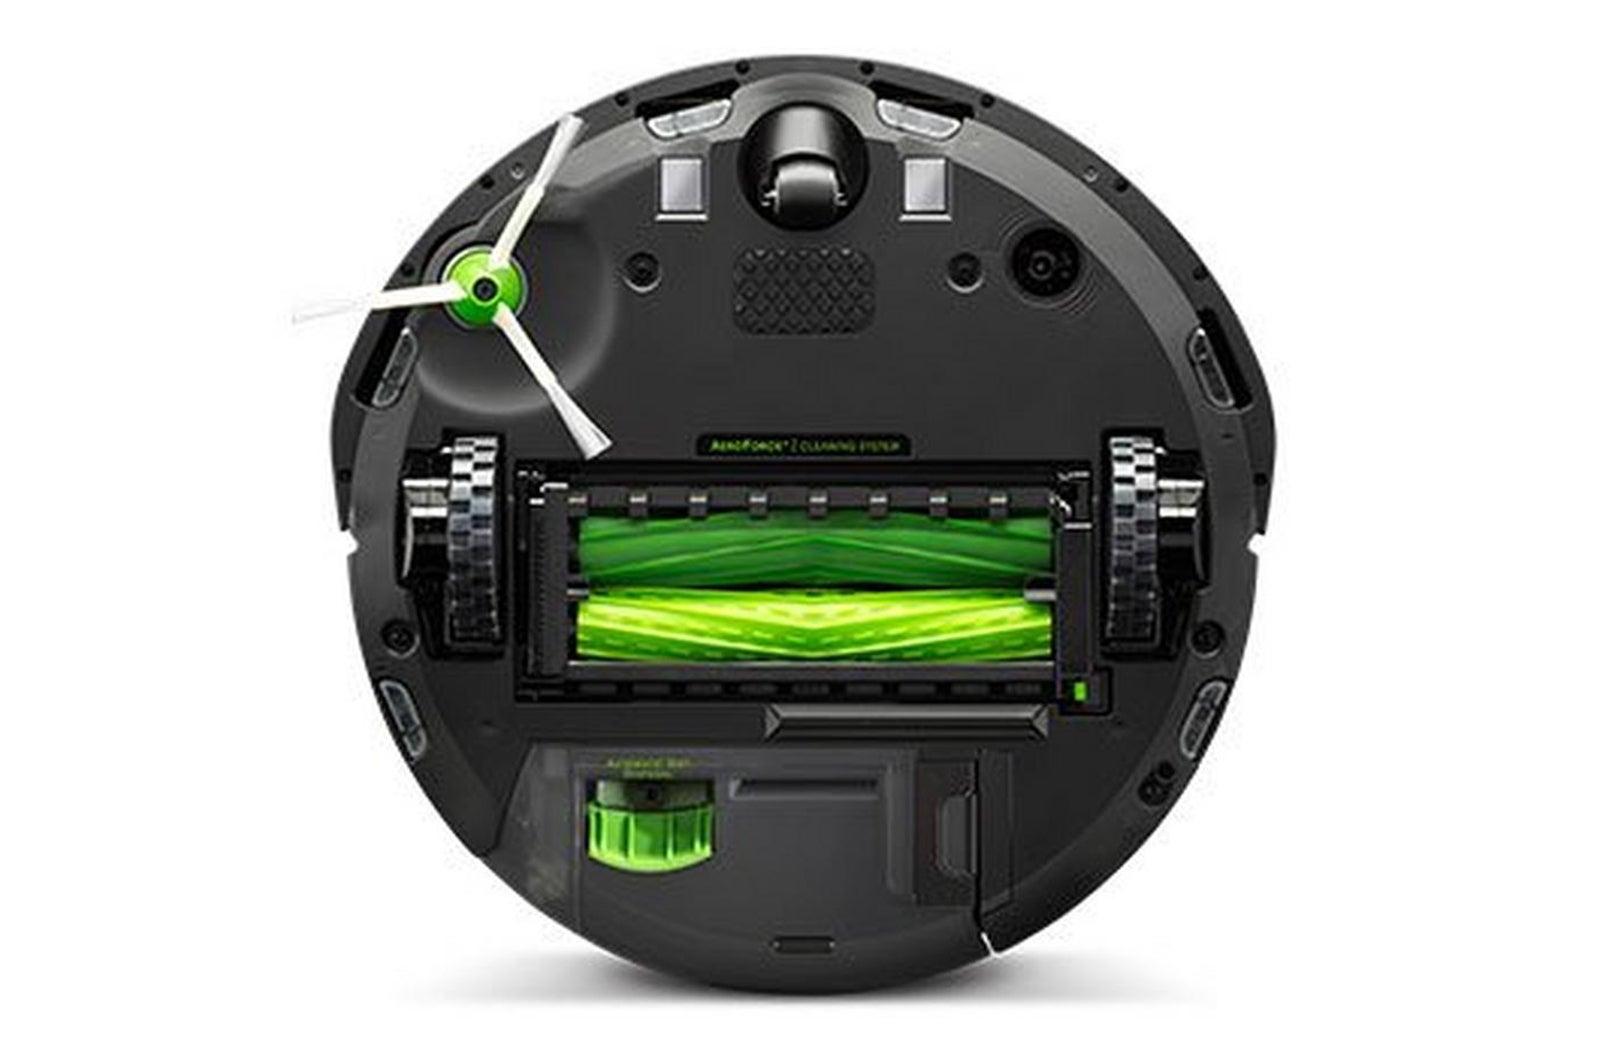 Irobot Roomba I7 Review This Robot Vacuum Empties Its